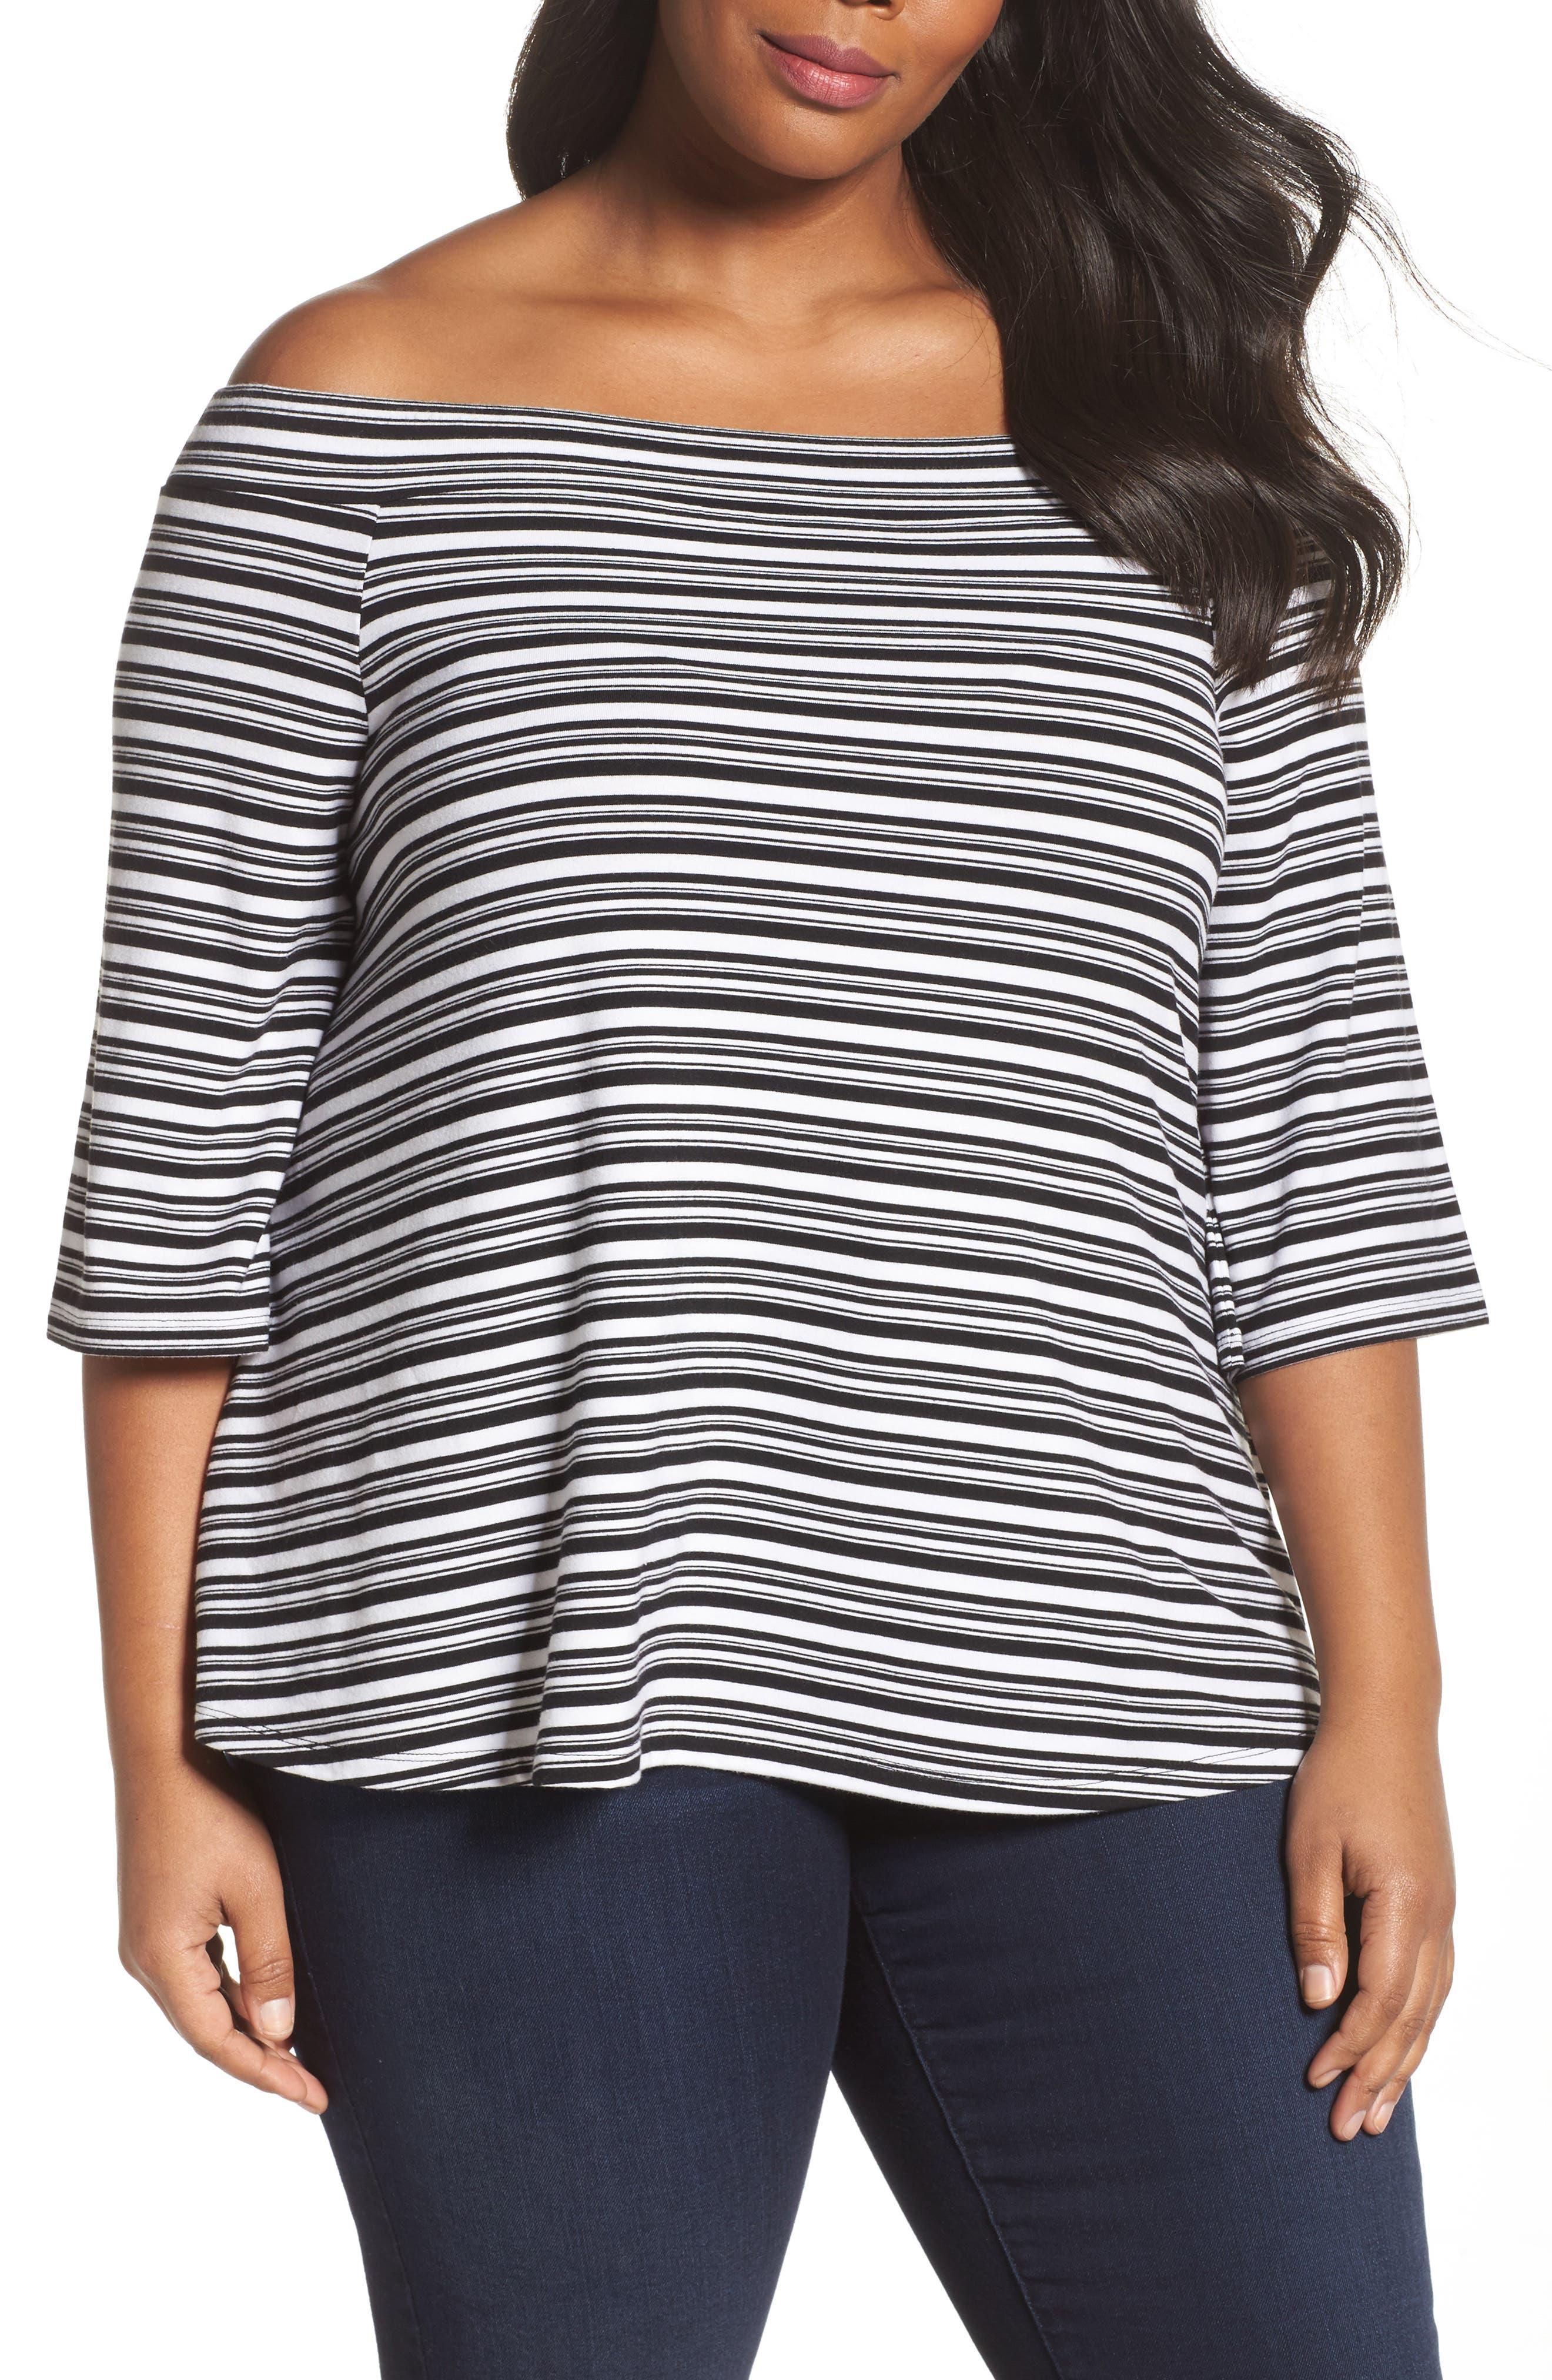 Stripe Off the Shoulder Top,                         Main,                         color, Black- White Veriegated Stripe